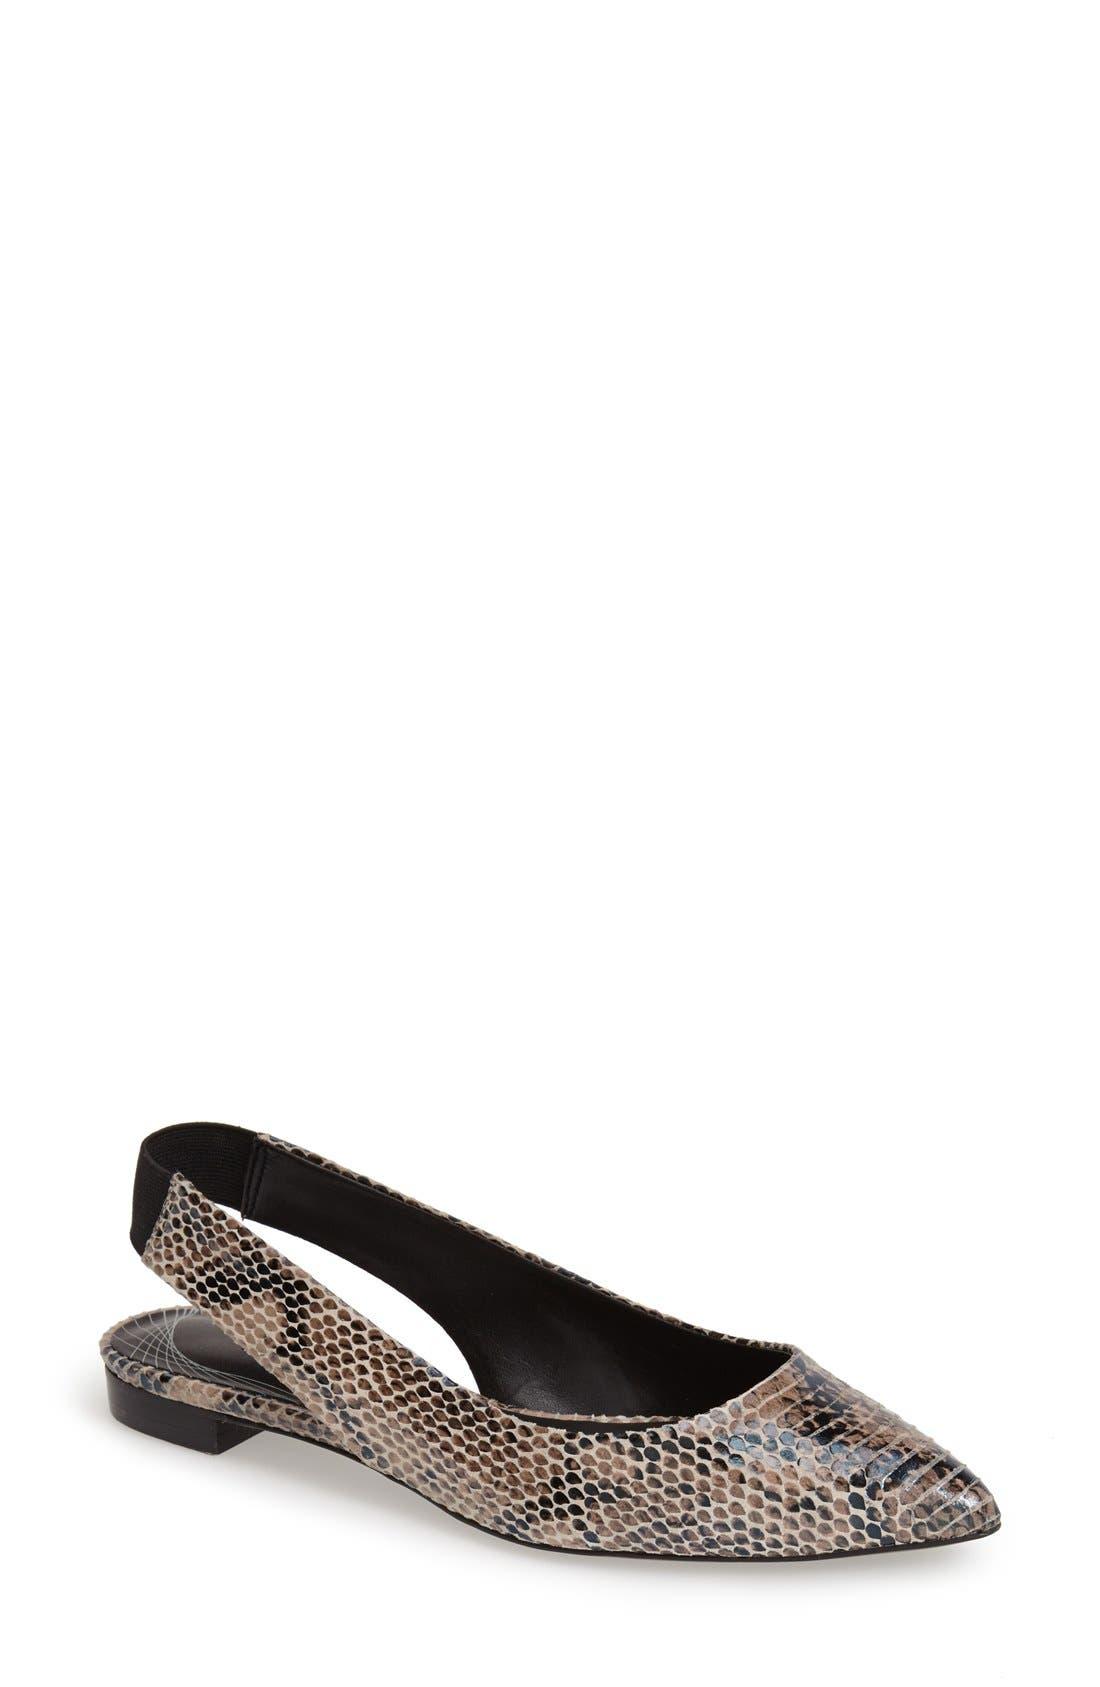 Main Image - Trouvé 'Mona' Pointy Toe Leather Flat (Women)